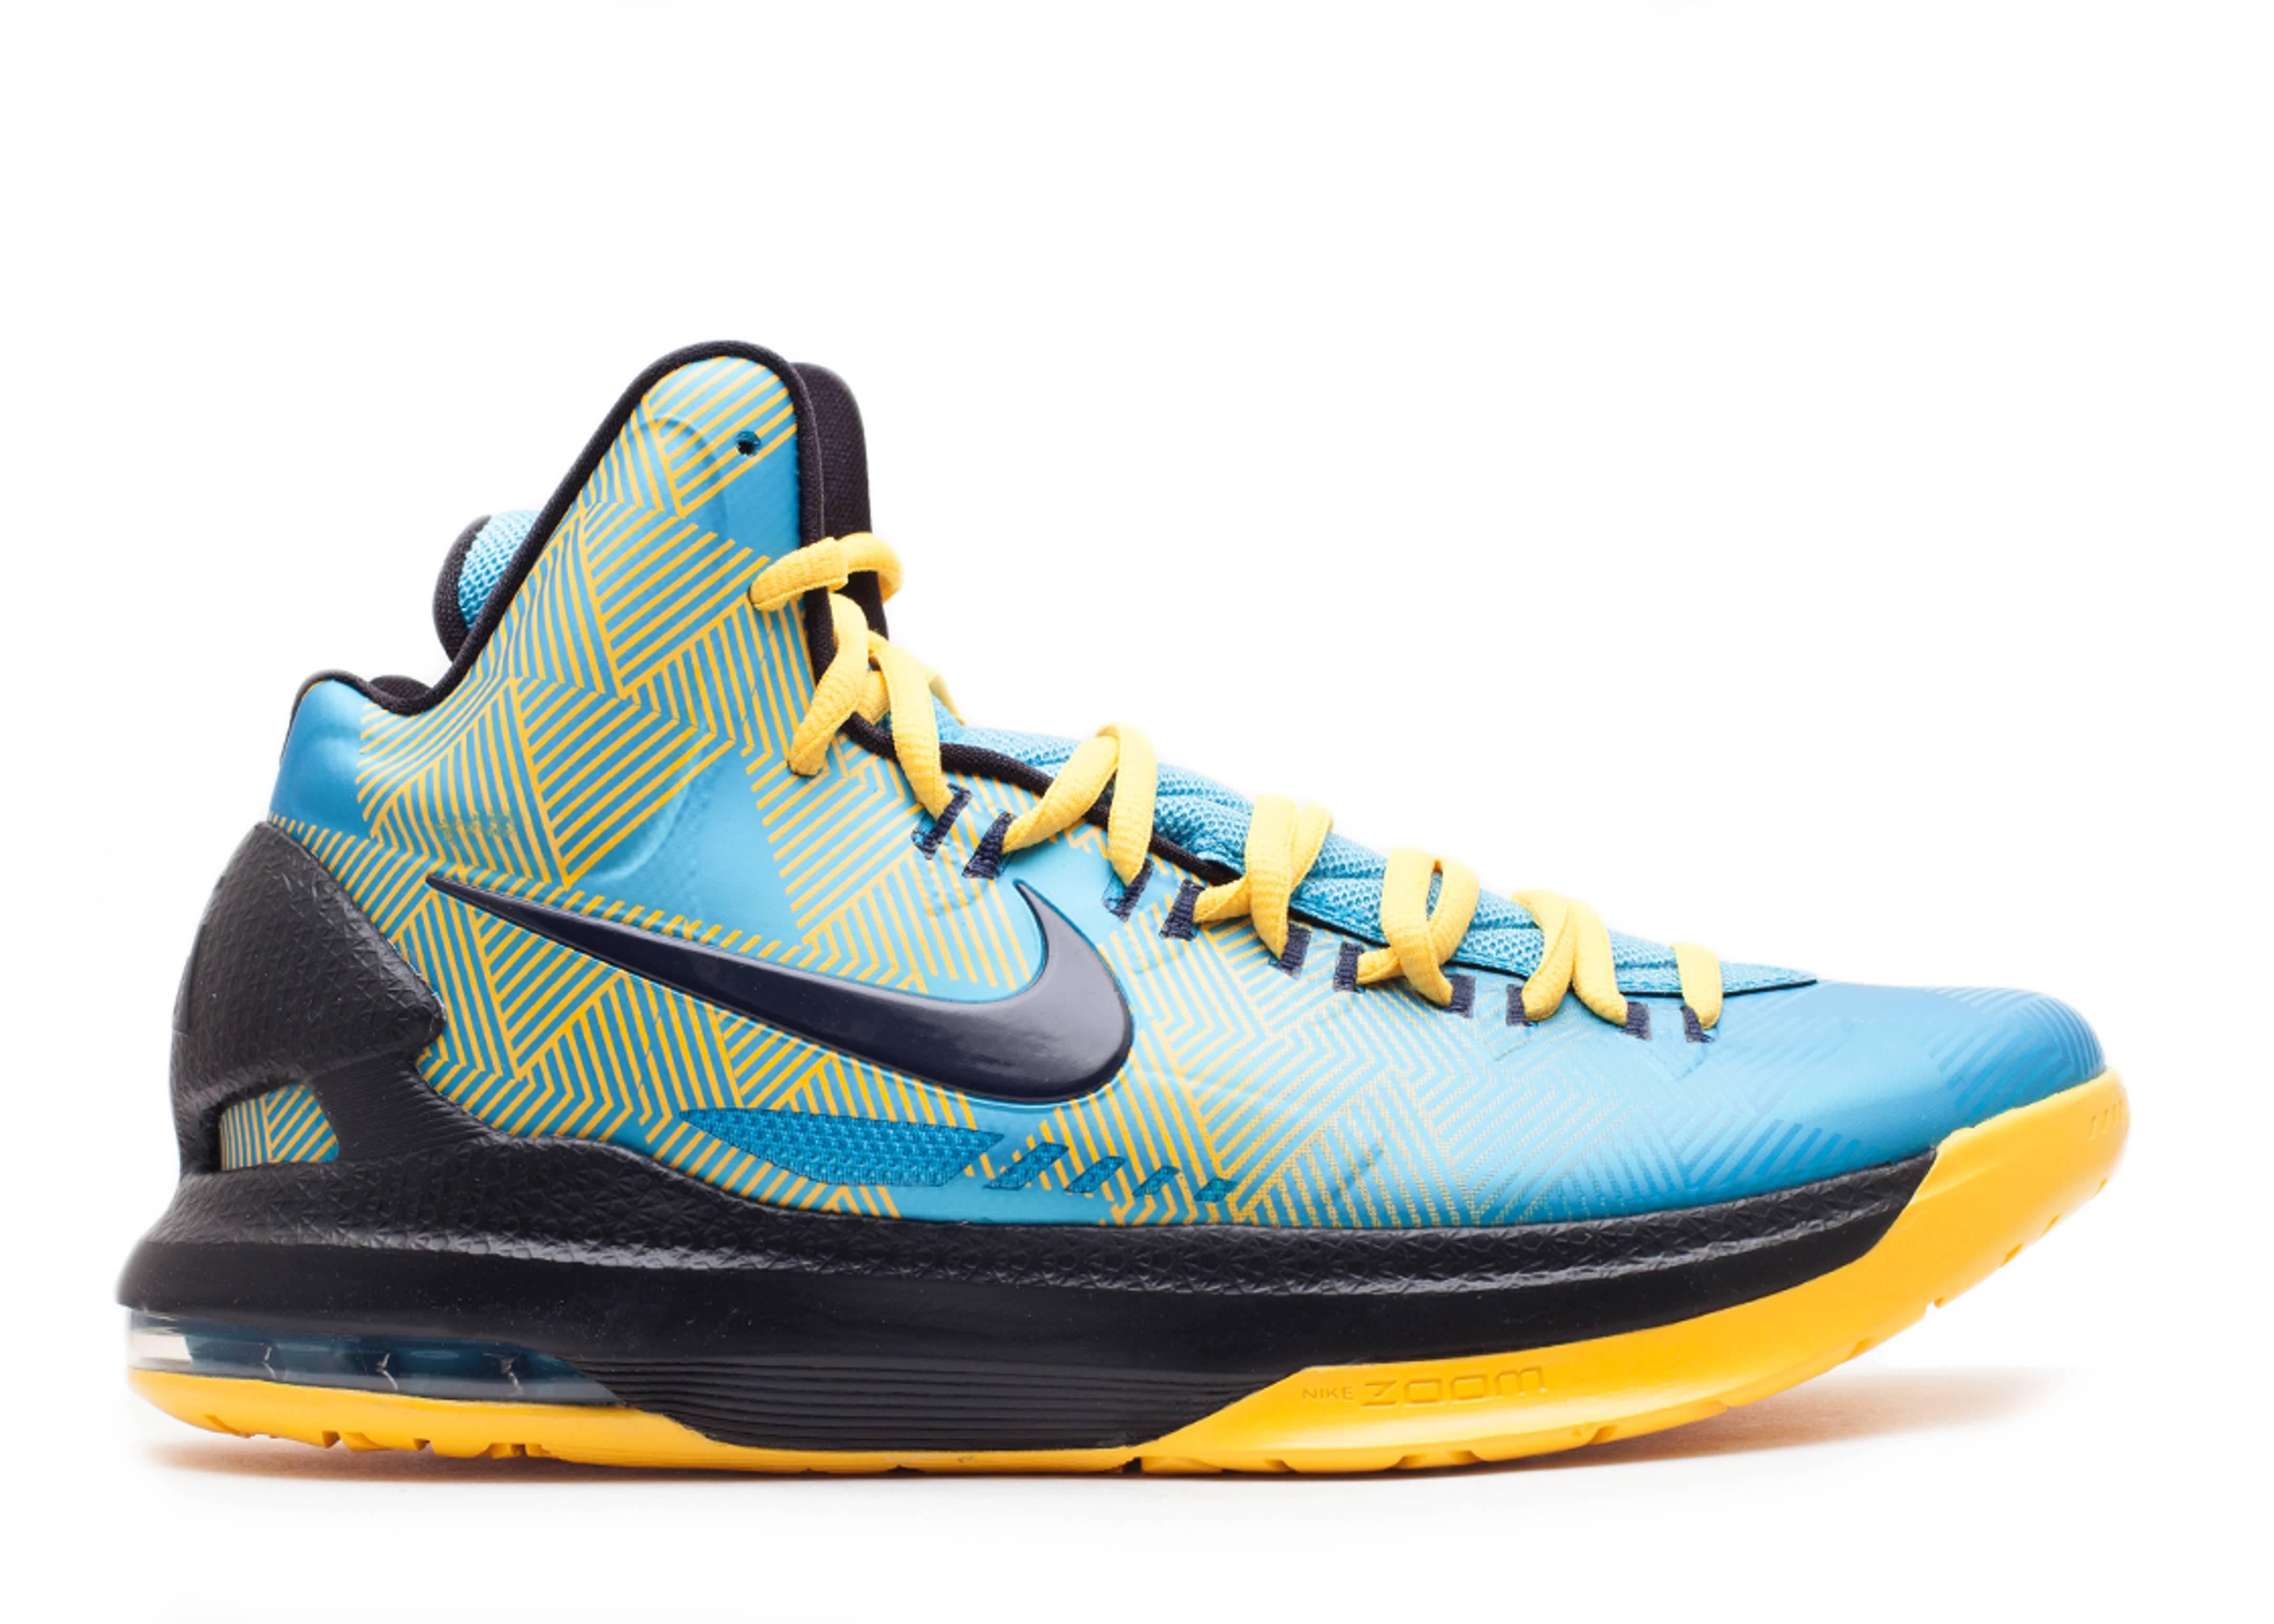 Nike Kd 5